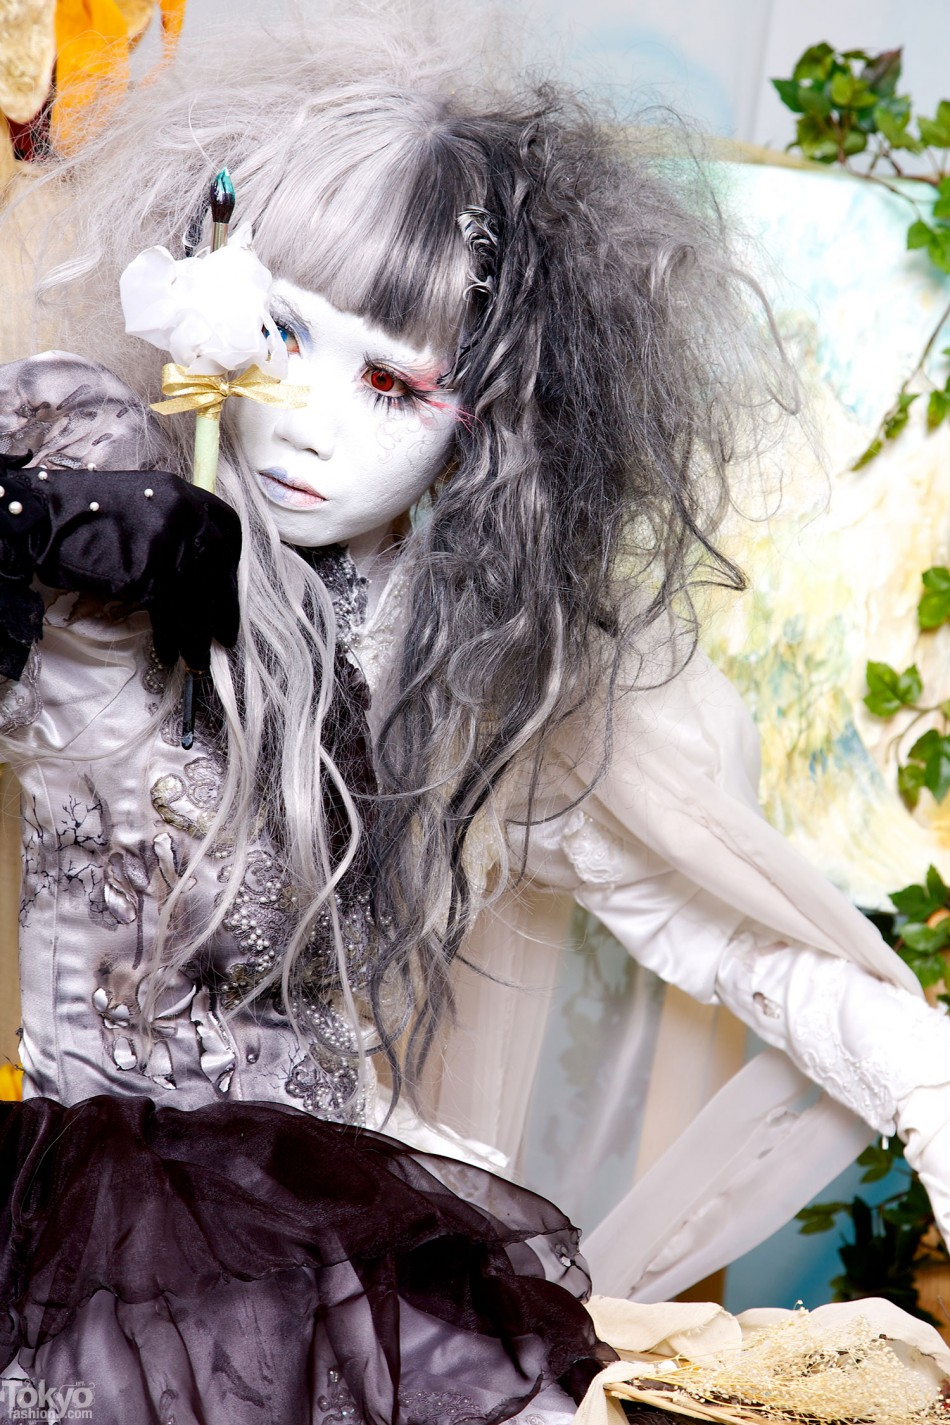 Minori - Her Memories of a Dream (5)